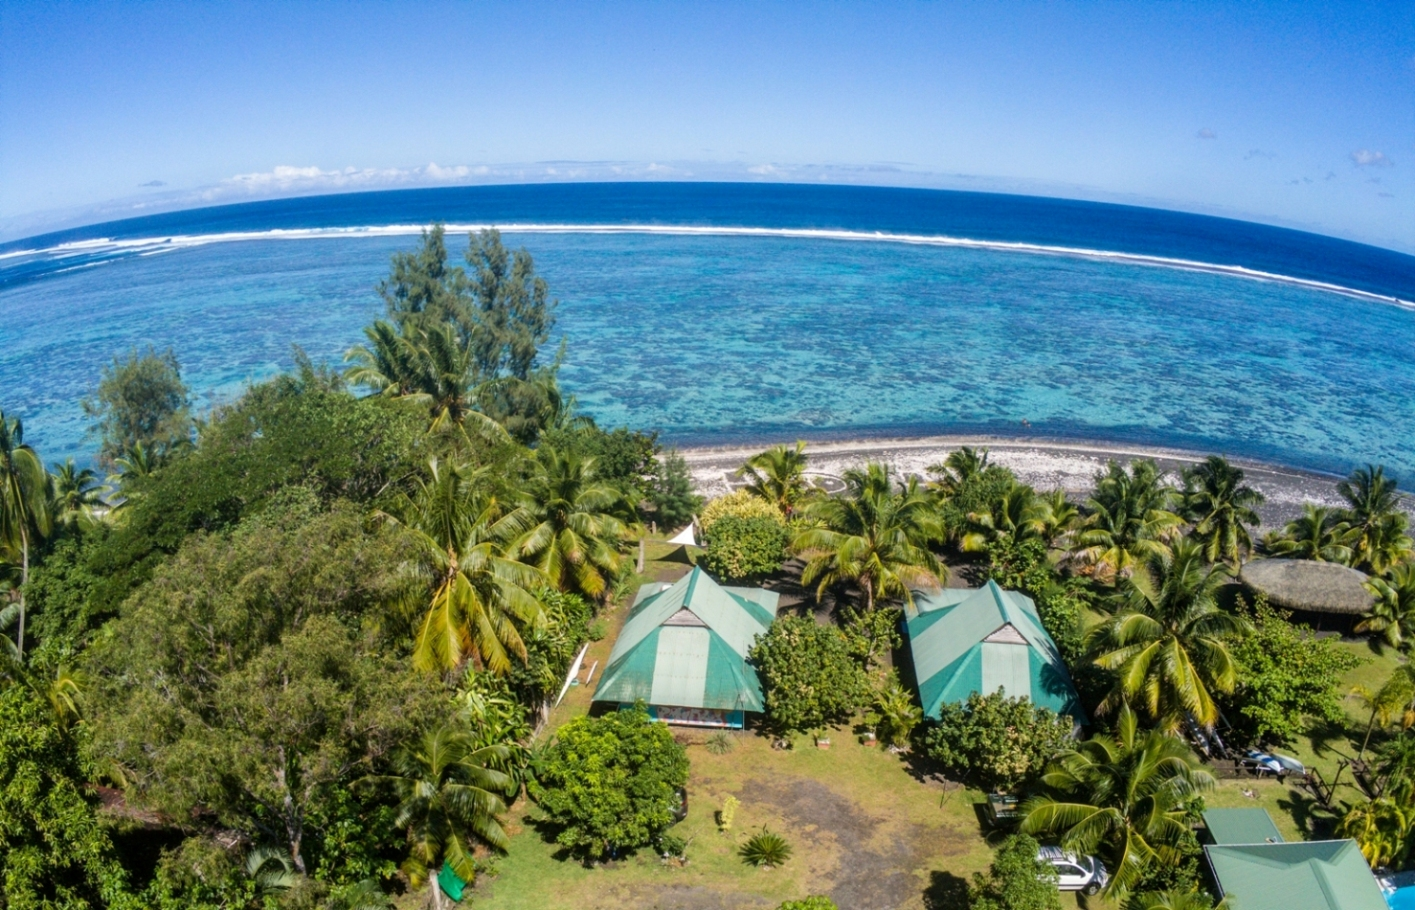 https://tahititourisme.mx/wp-content/uploads/2019/08/copie-Tahiti-tourisme-948ko.jpg